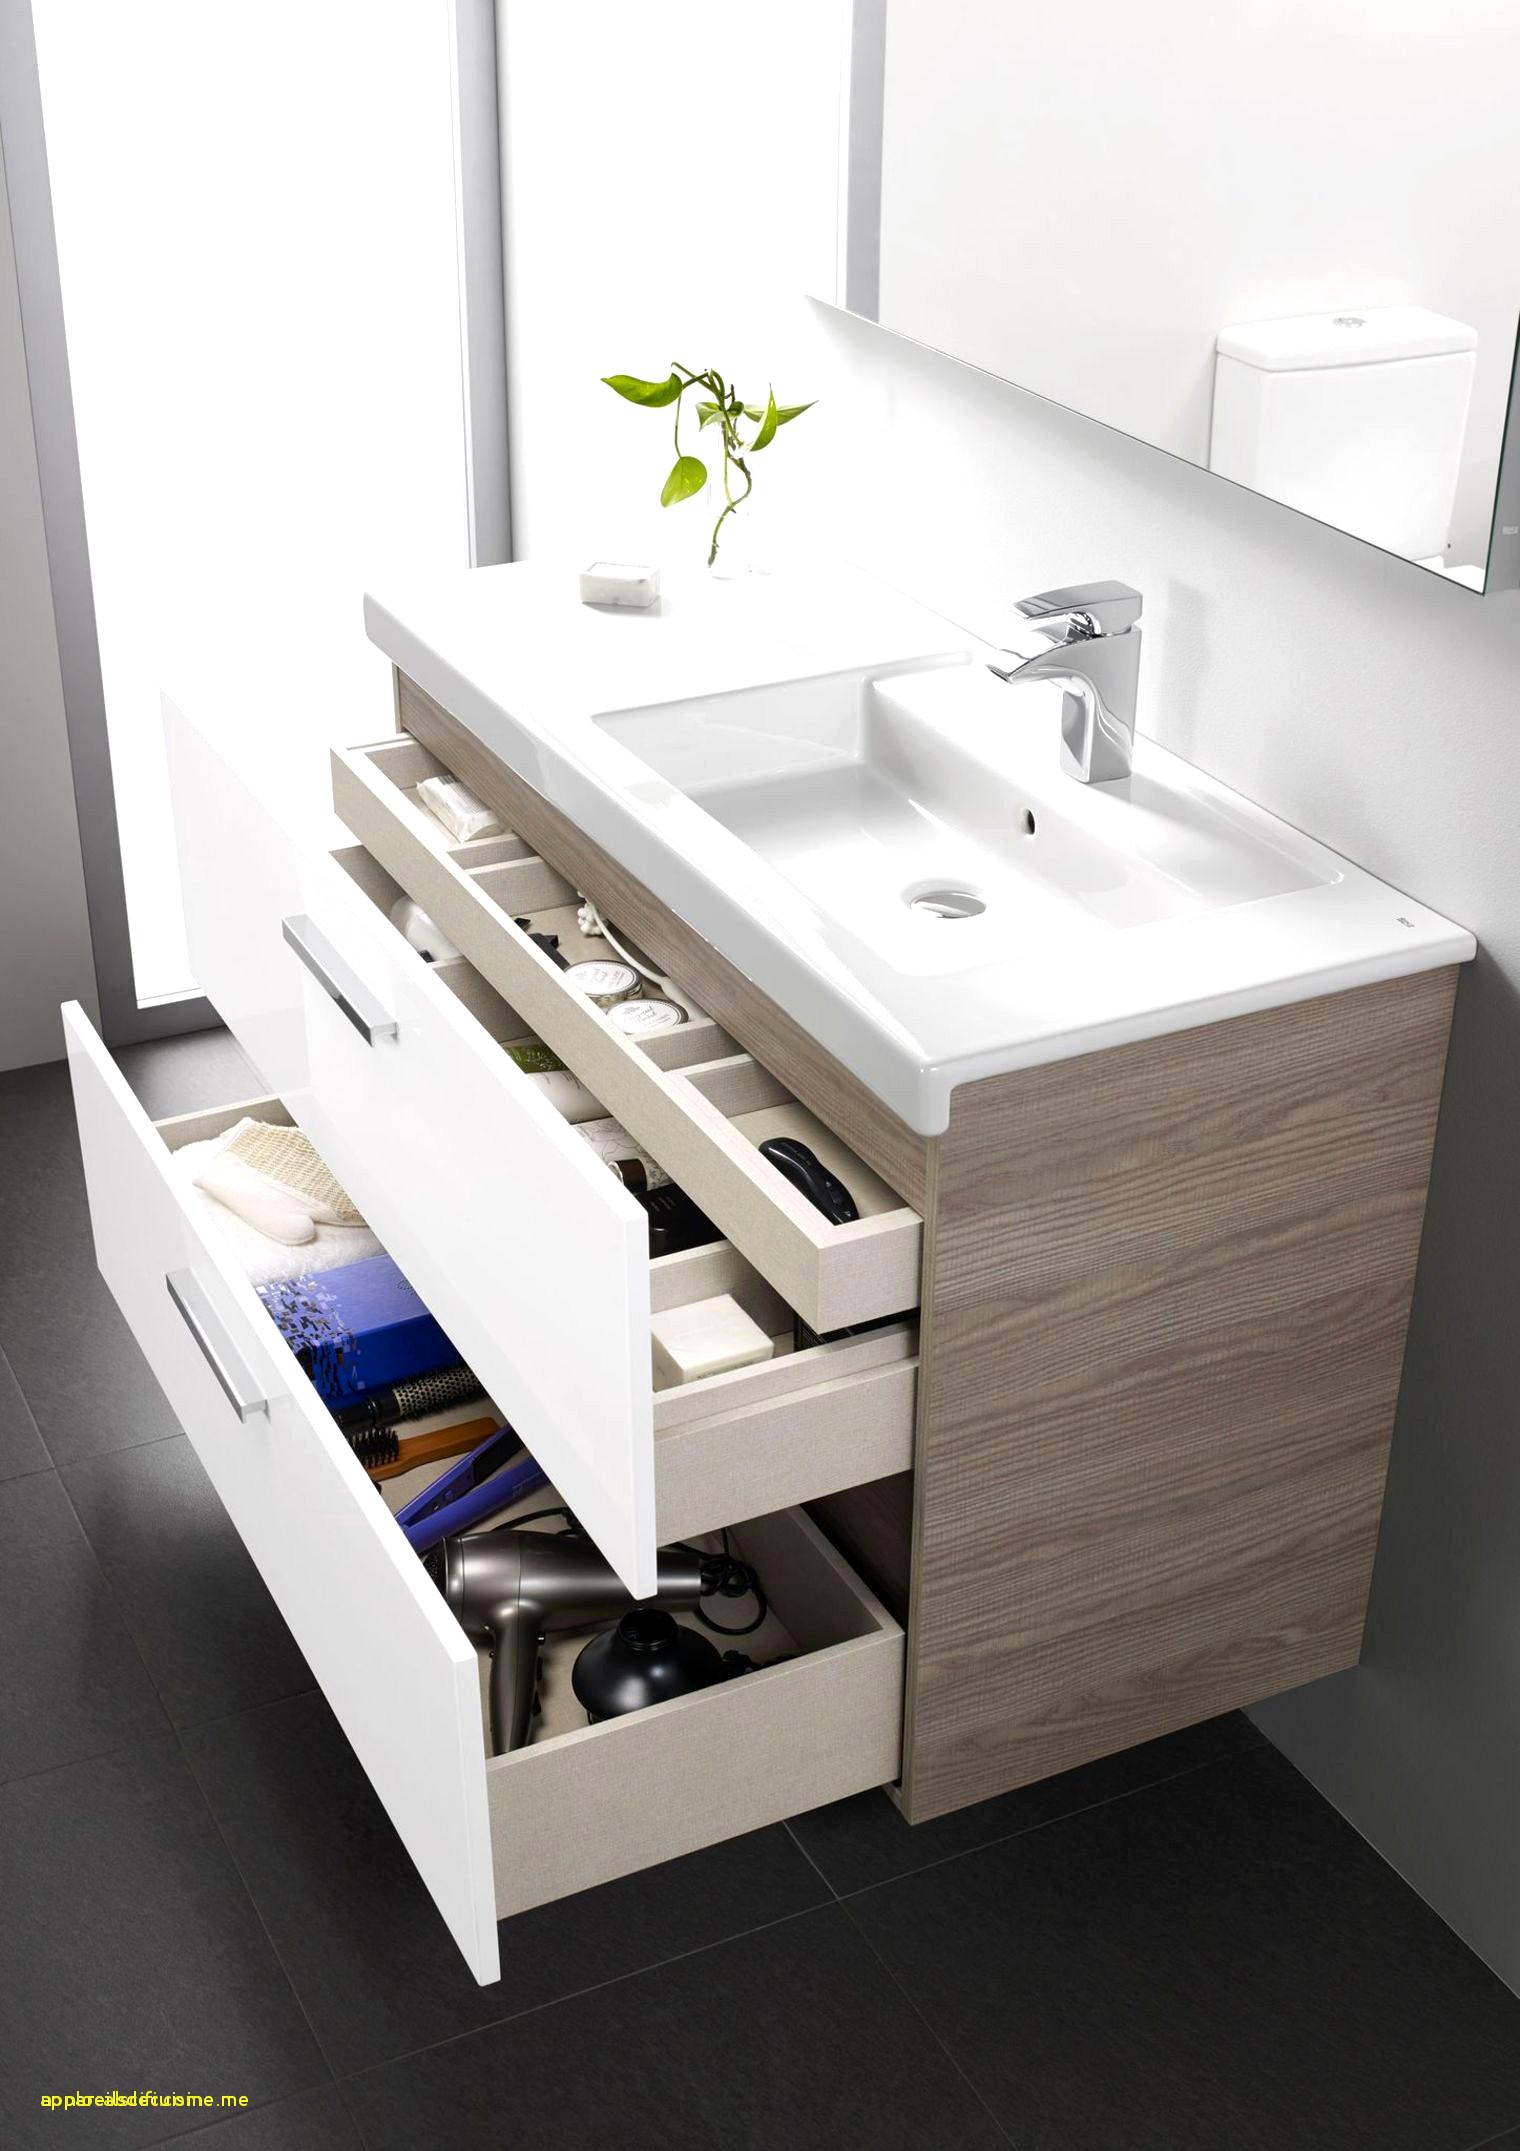 Fabriquer meuble salle de bain pas cher frais image best fabriquer meuble sdb contemporary - Evier salle de bain pas cher ...